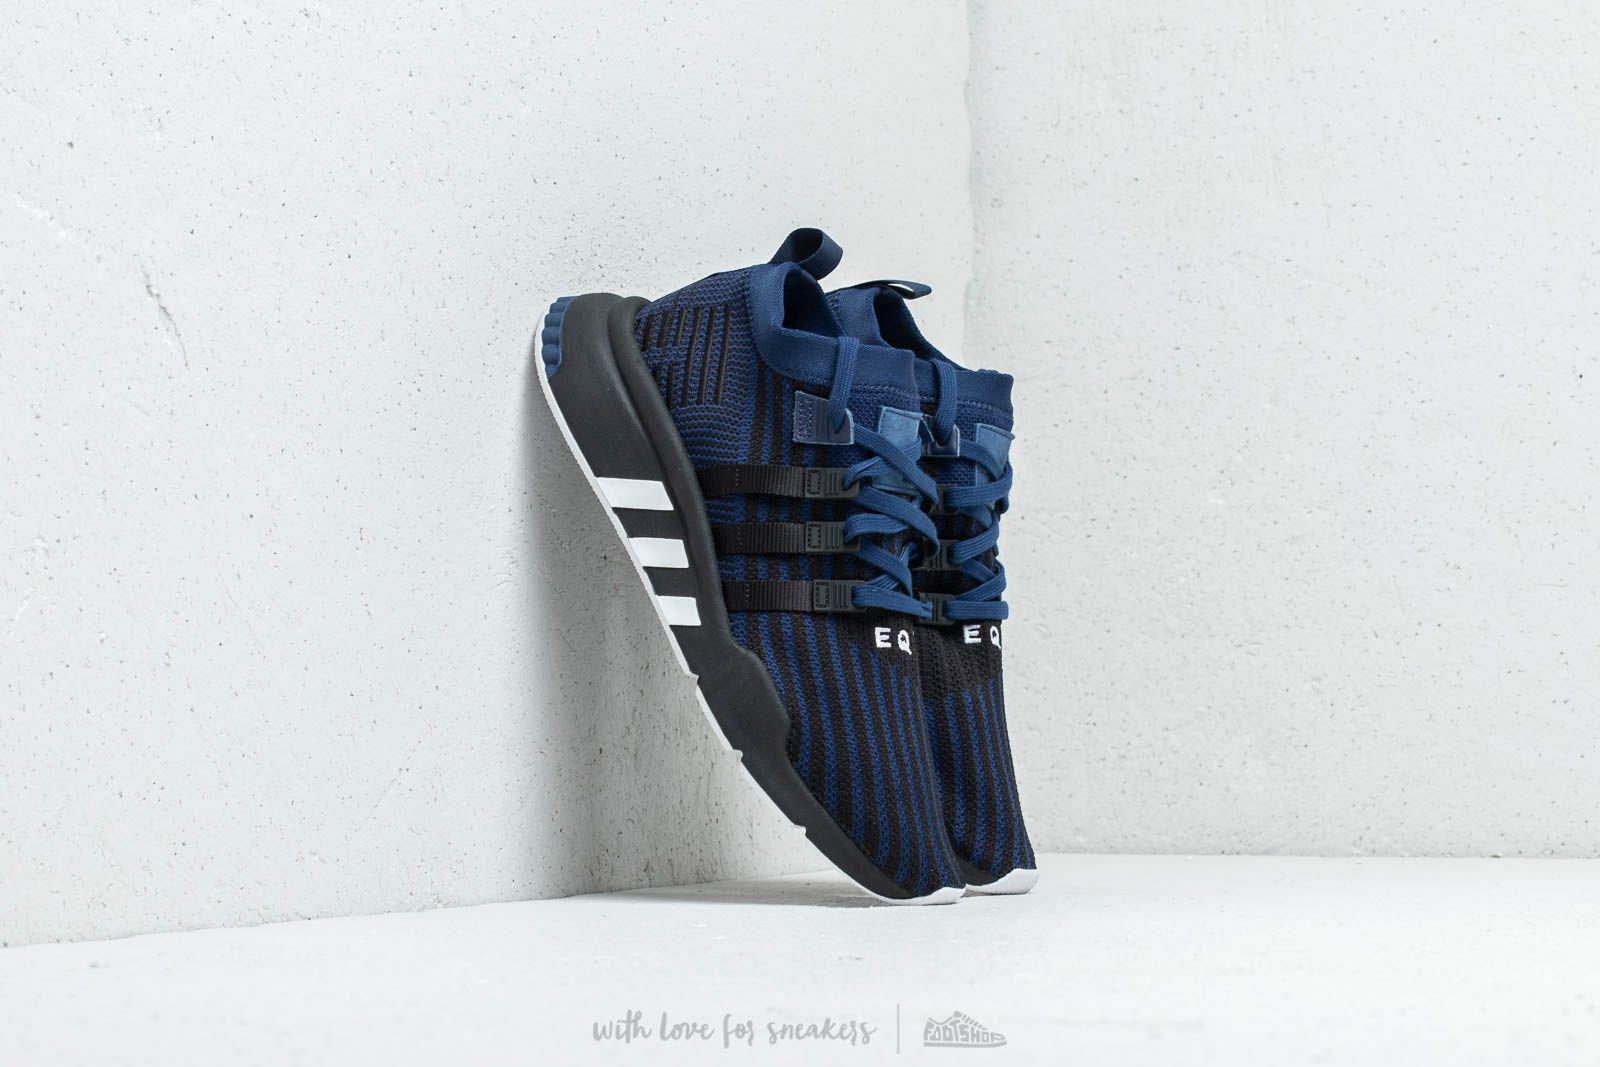 8fe9cdb359b5 Lyst - adidas Originals Adidas Eqt Support Mid Adv Pk Dark Blue ...